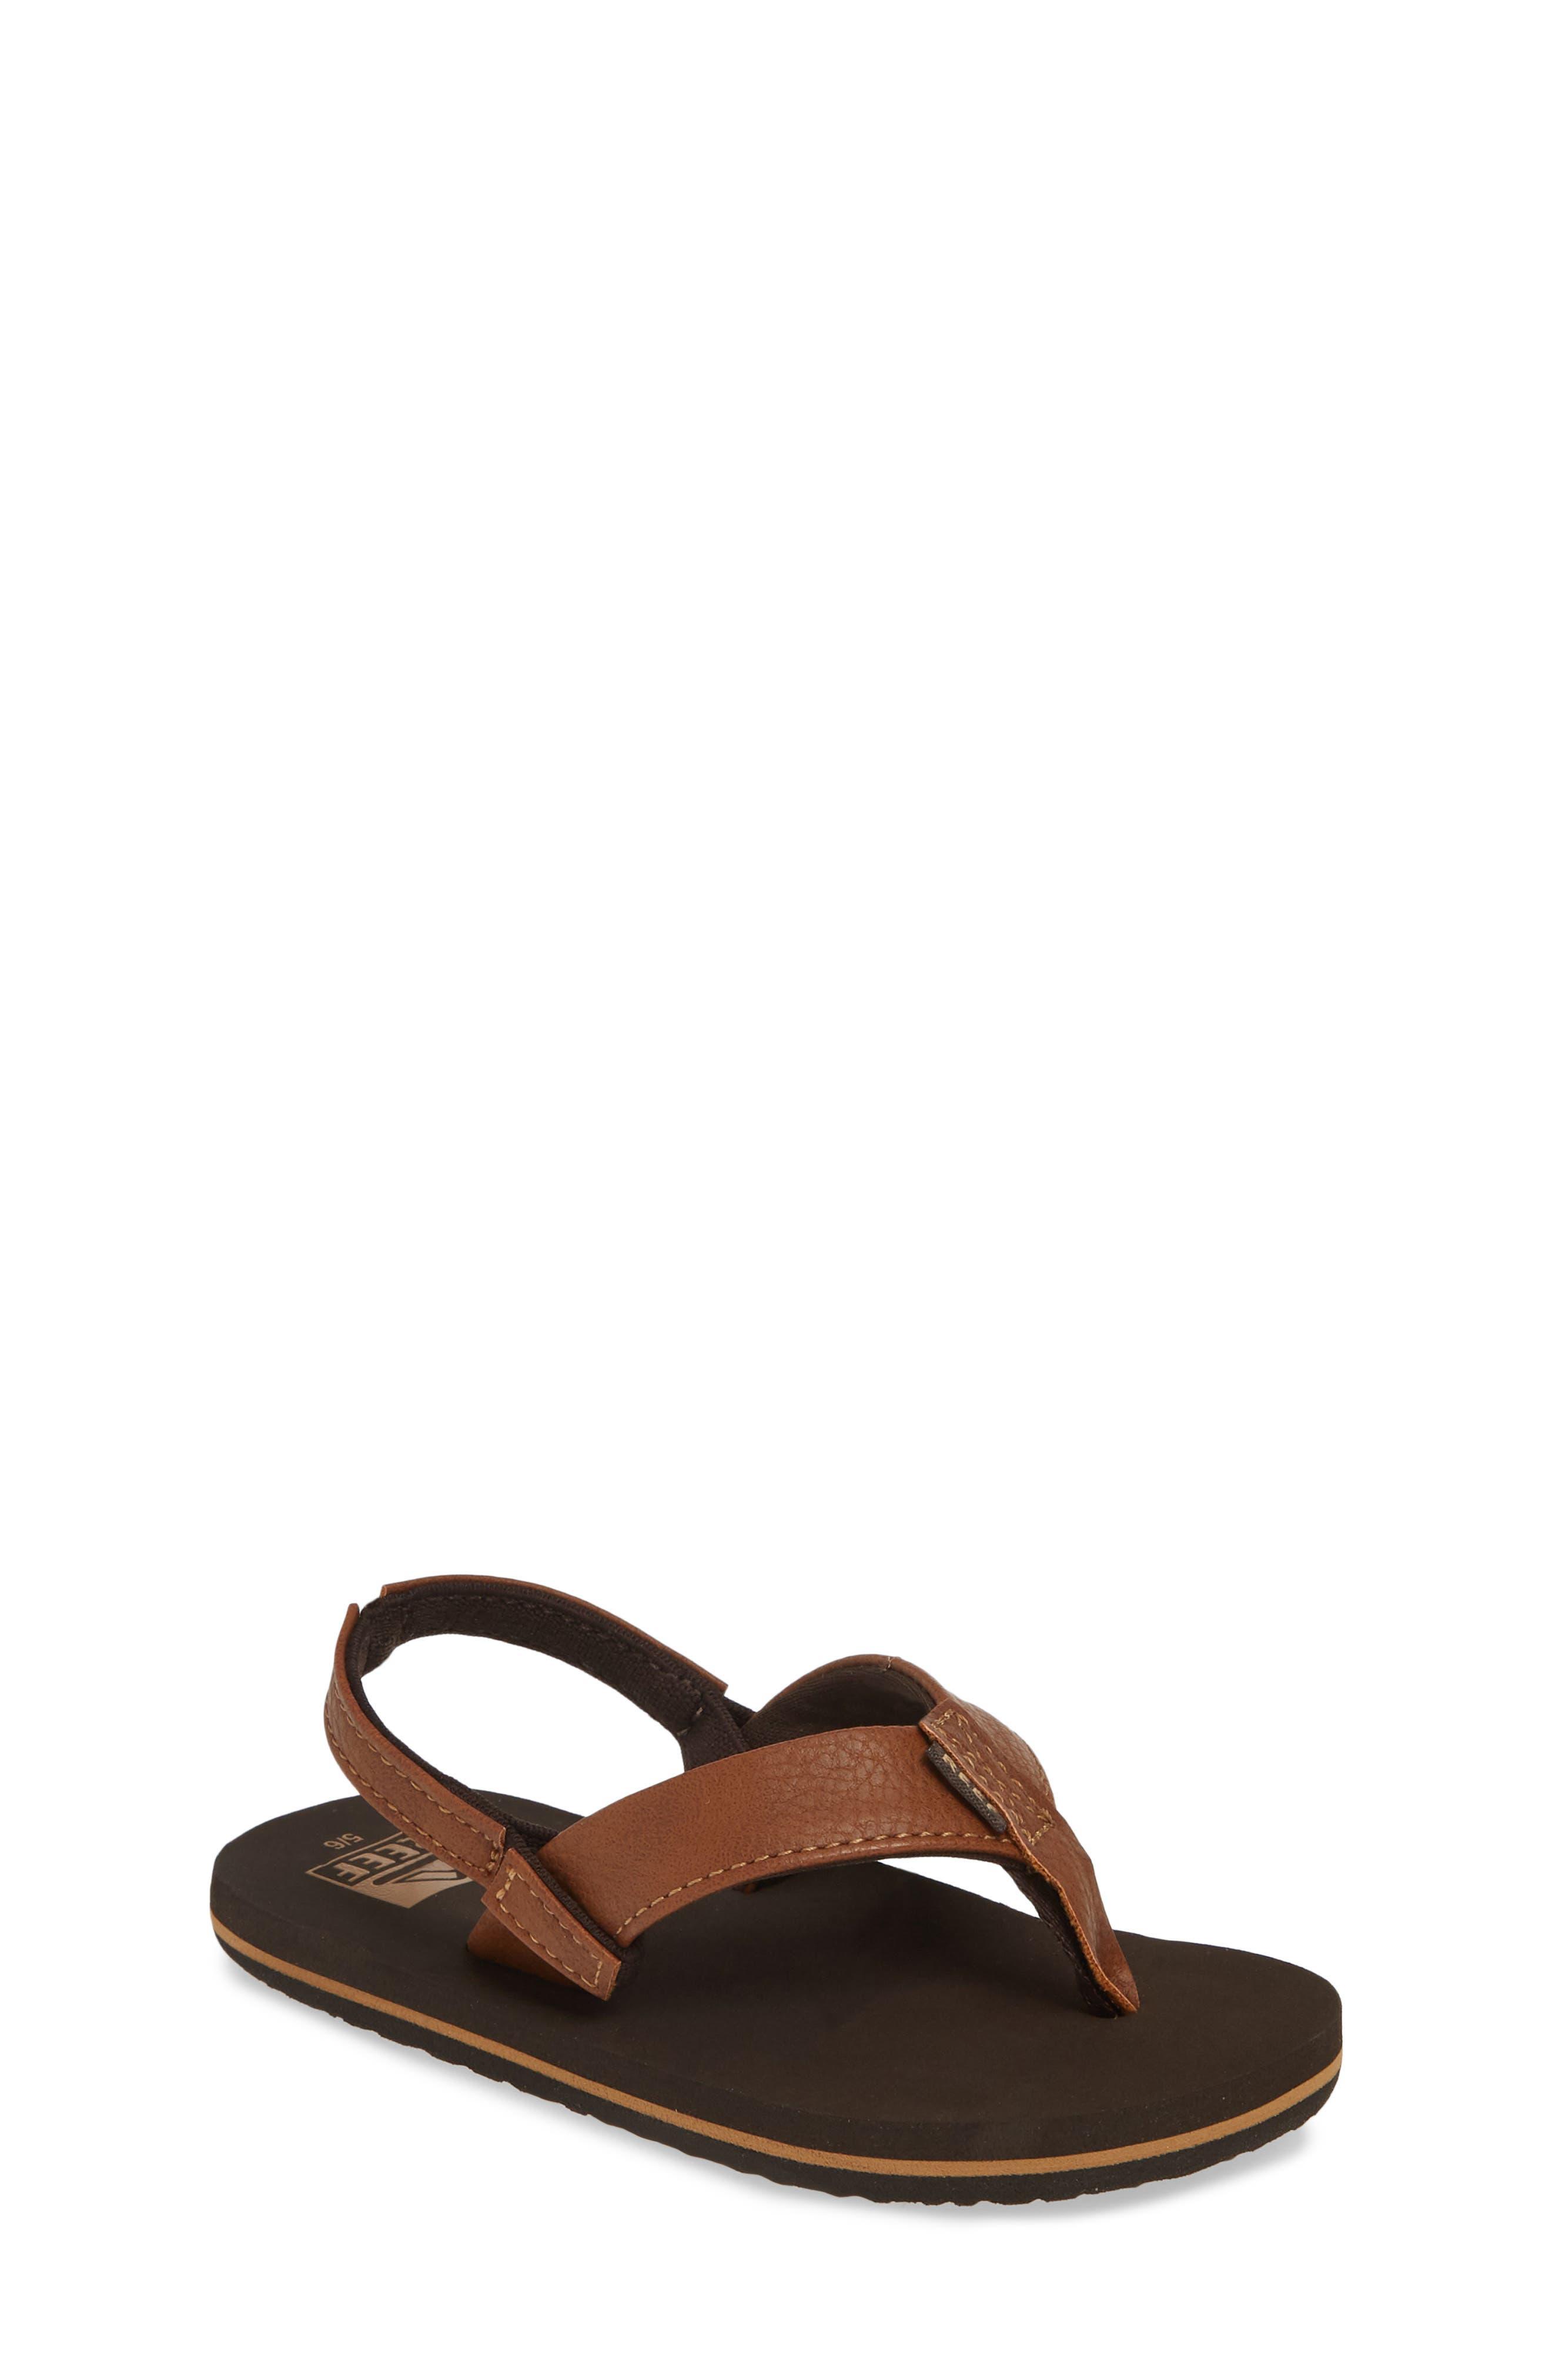 REEF Twinpin Thong Sandal, Main, color, BROWN